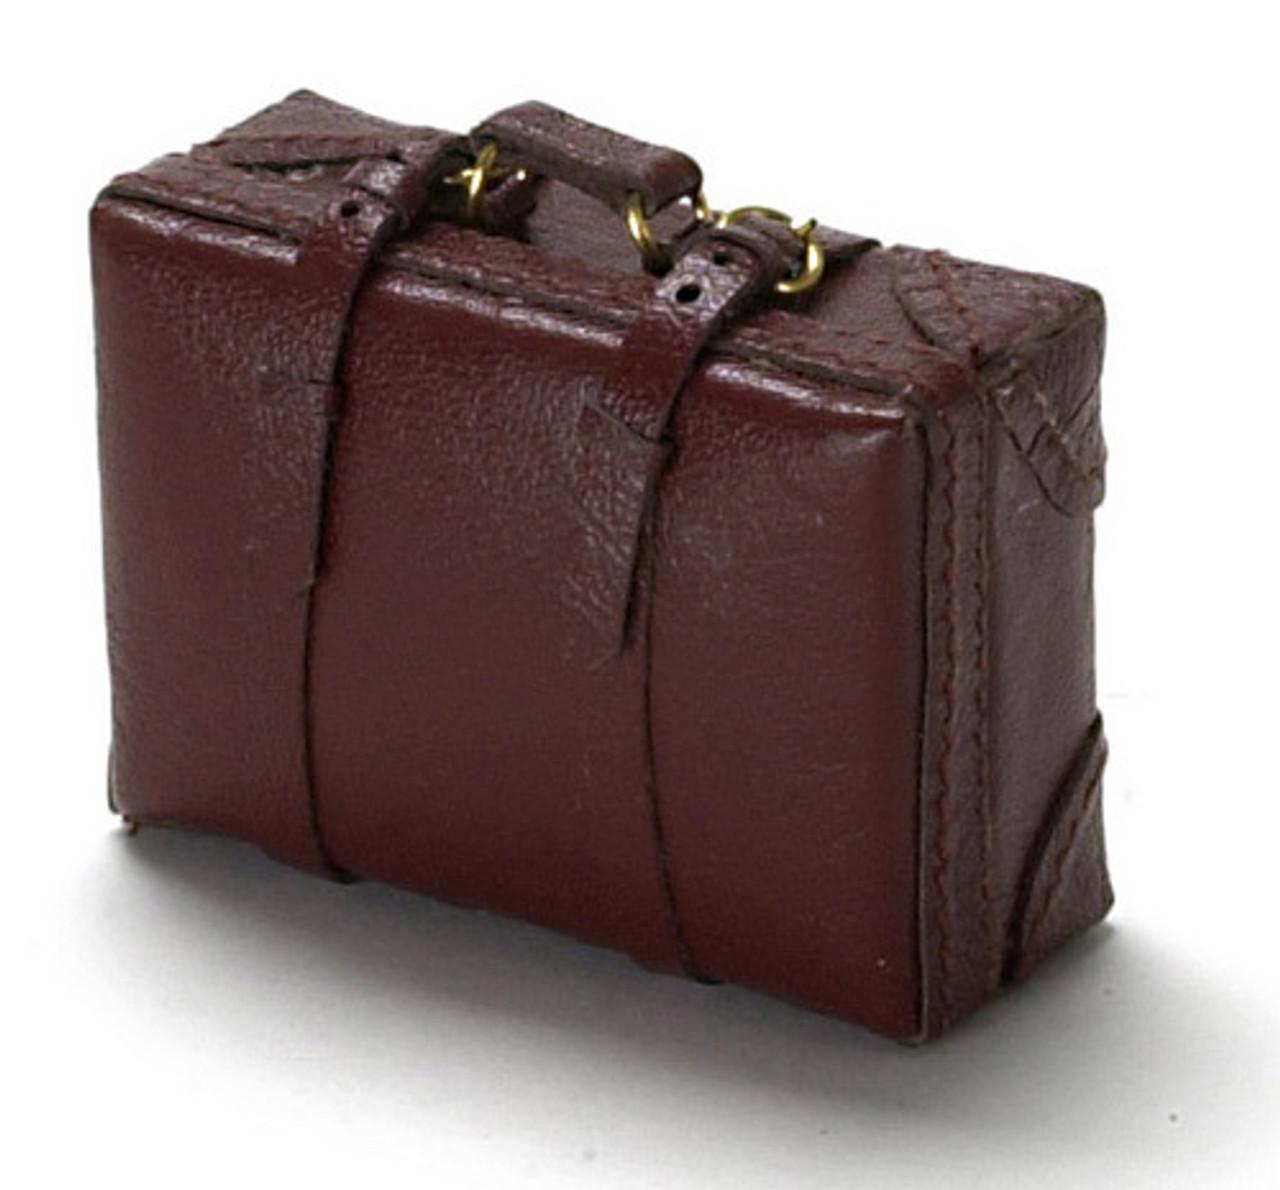 Dollhouse City - Dollhouse Miniatures Suitcase - Small